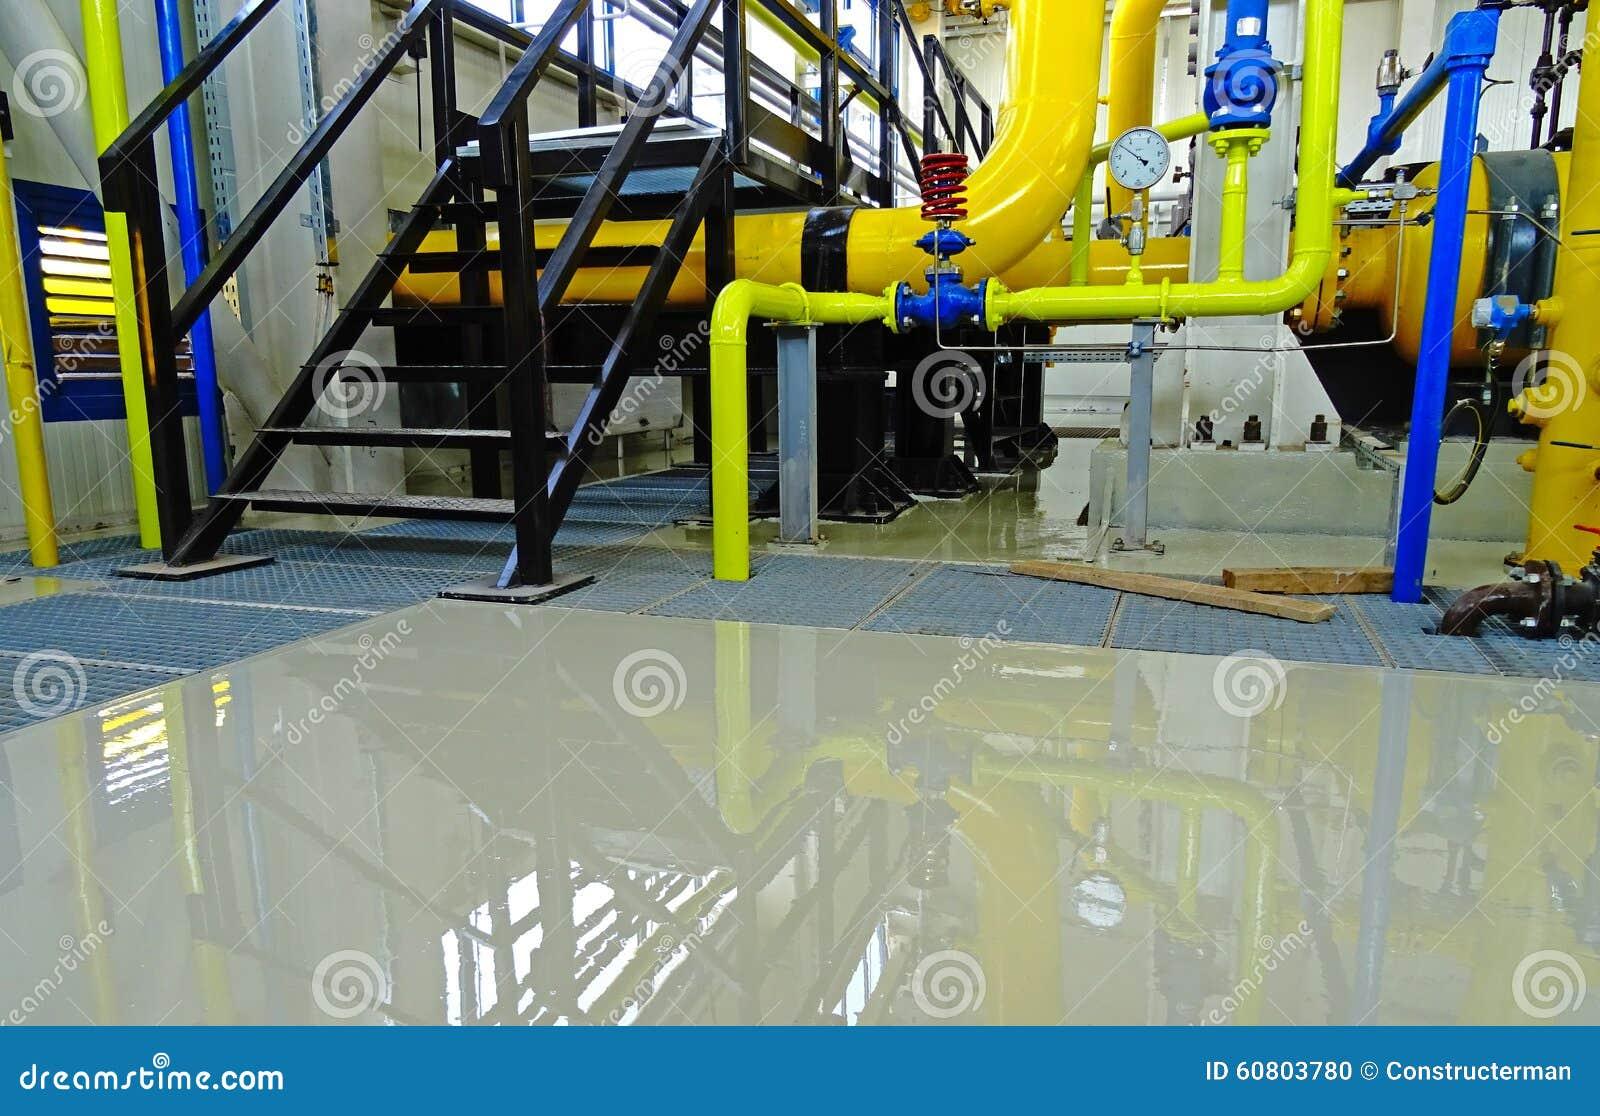 Industrial Epoxy Floor Stock Photo Image 60803780